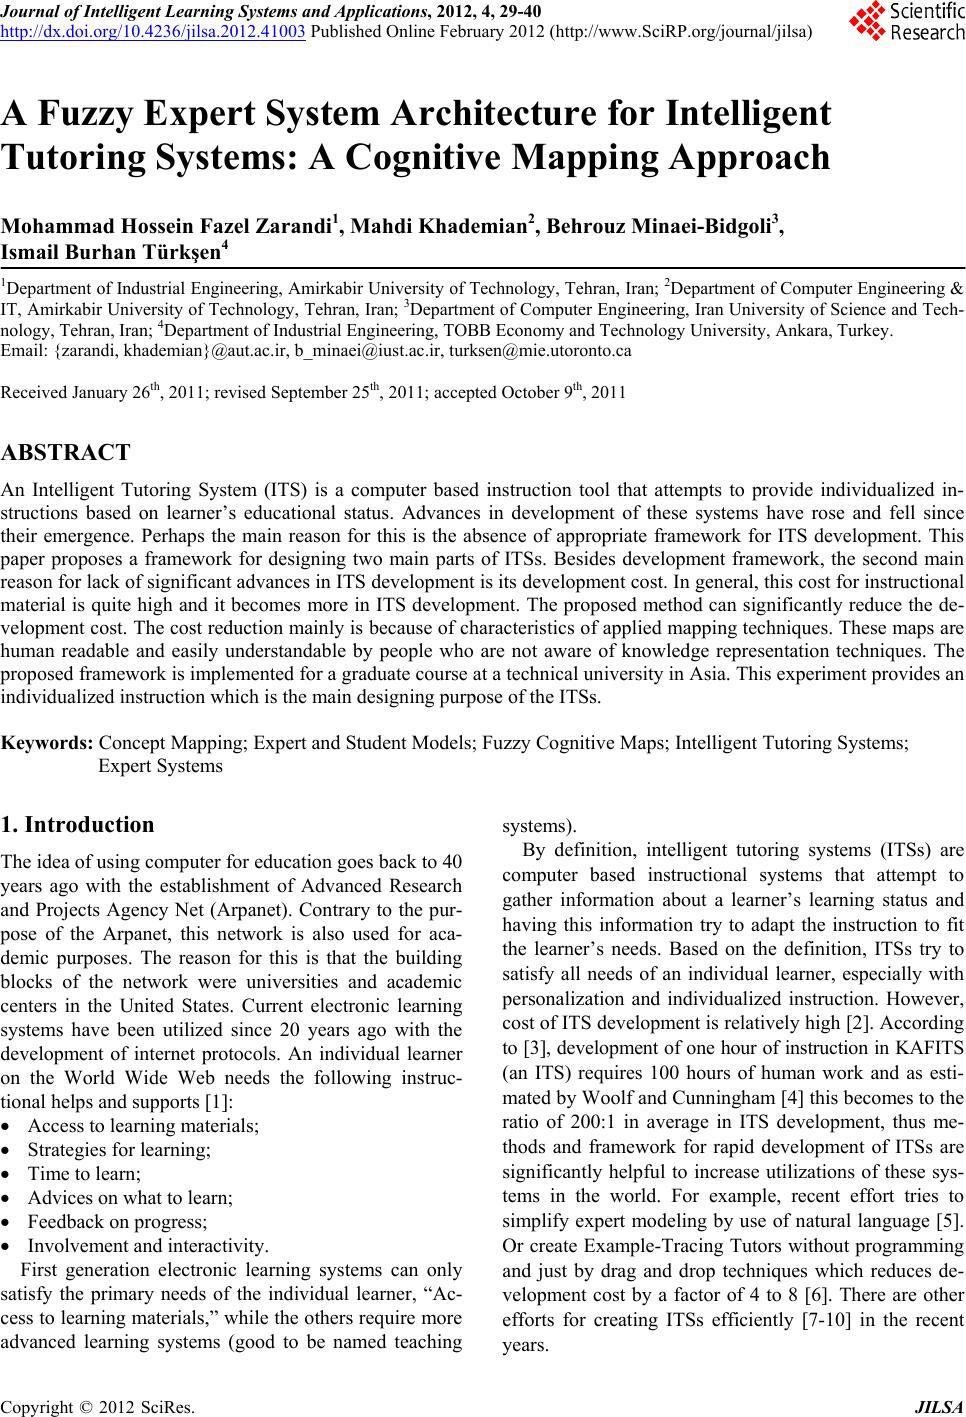 journal of intelligent & fuzzy systems pdf